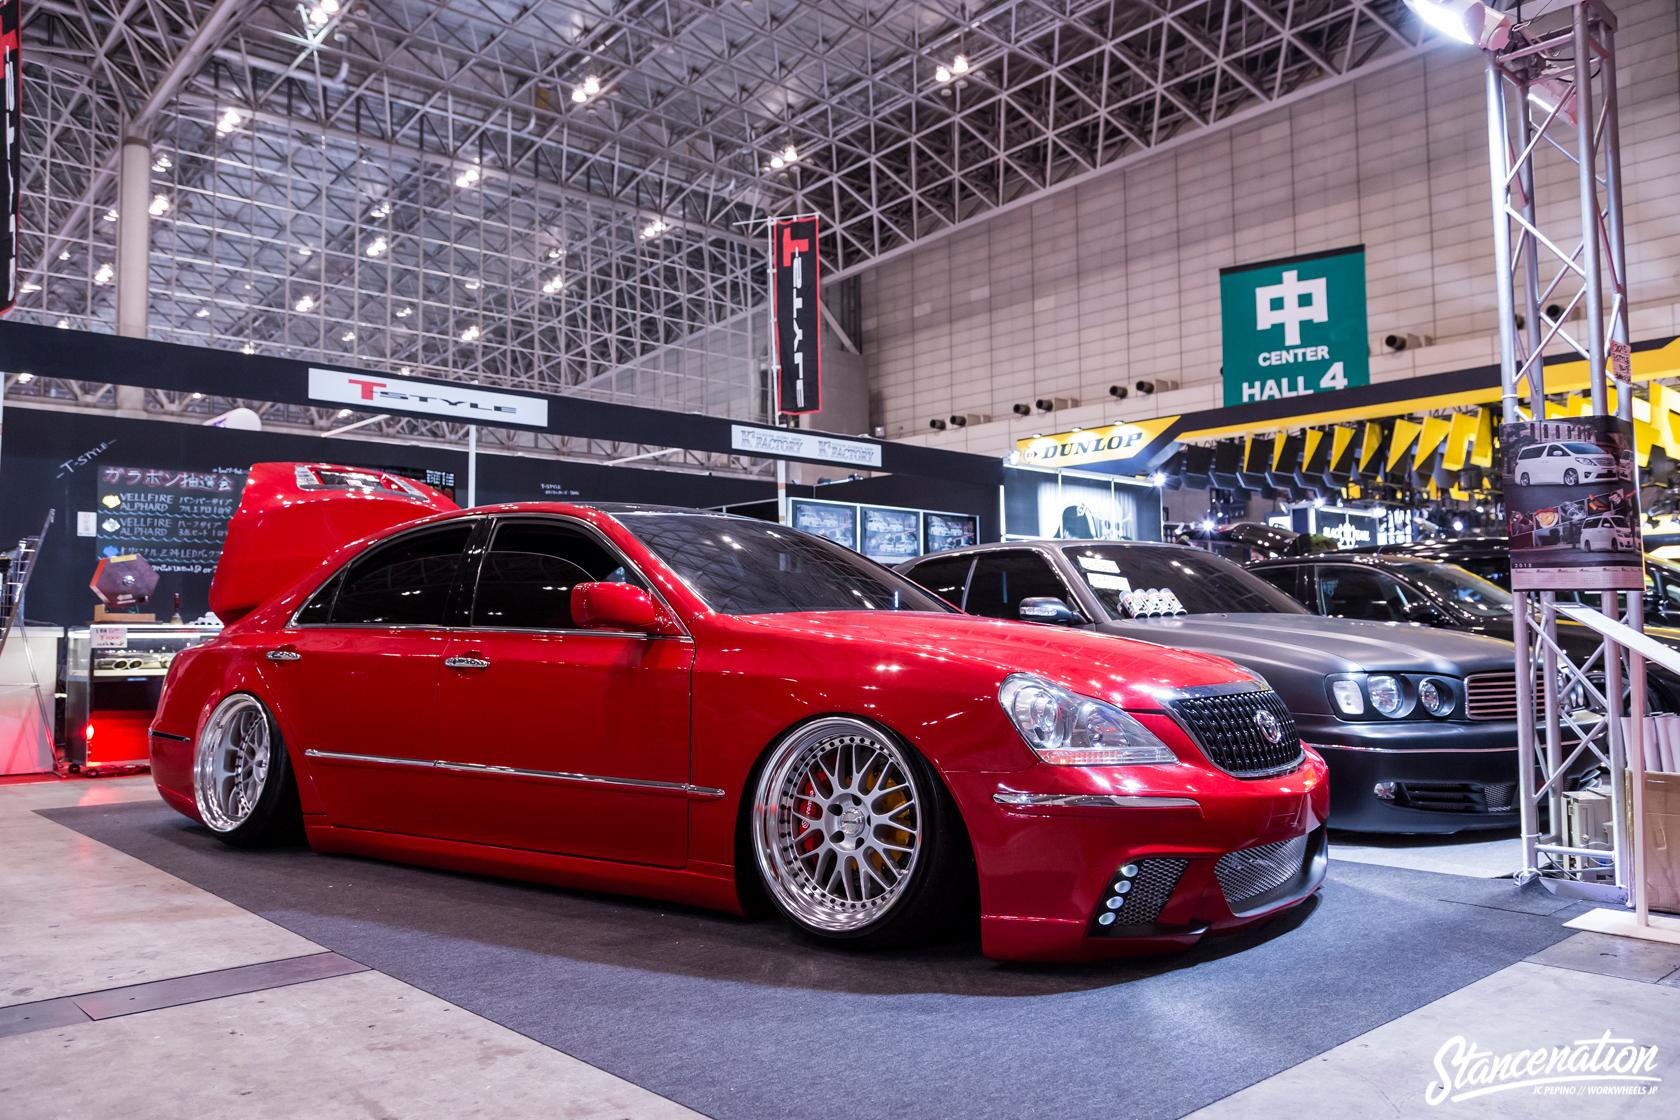 Tokyo auto salon 2015 photo coverage part 2 - Tokyo auto salon 2015 ...